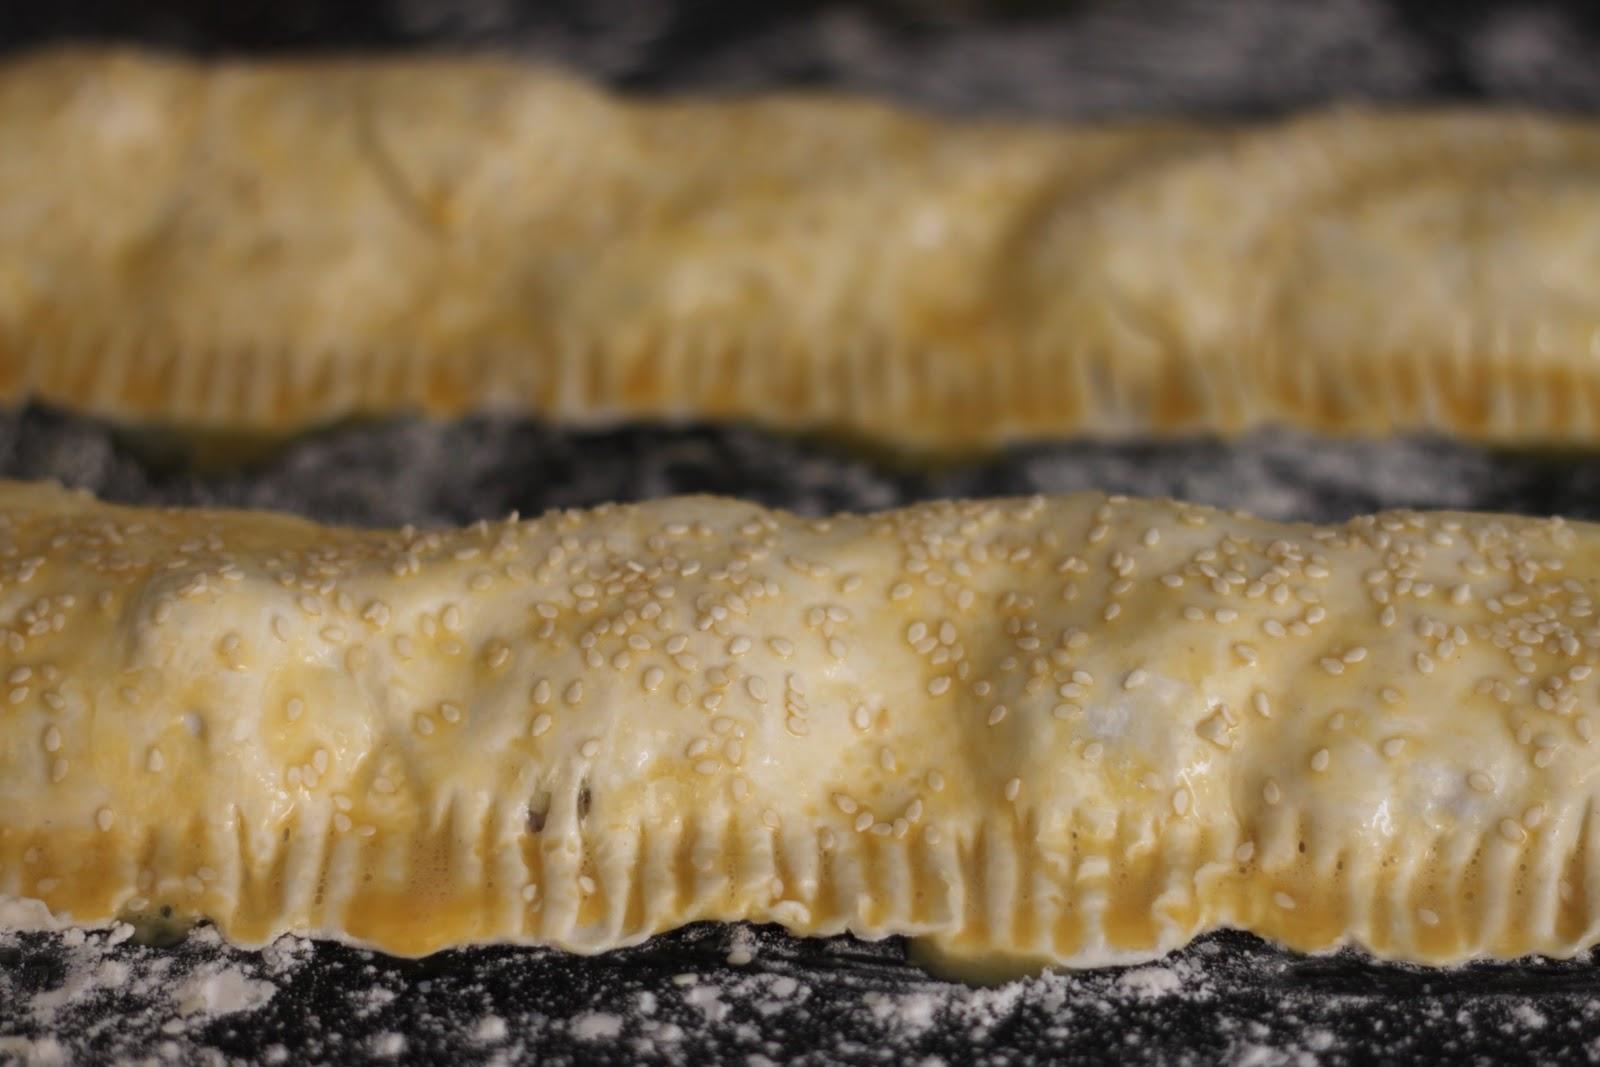 Dine at Mine: Sausage Rolls at Florence Finds